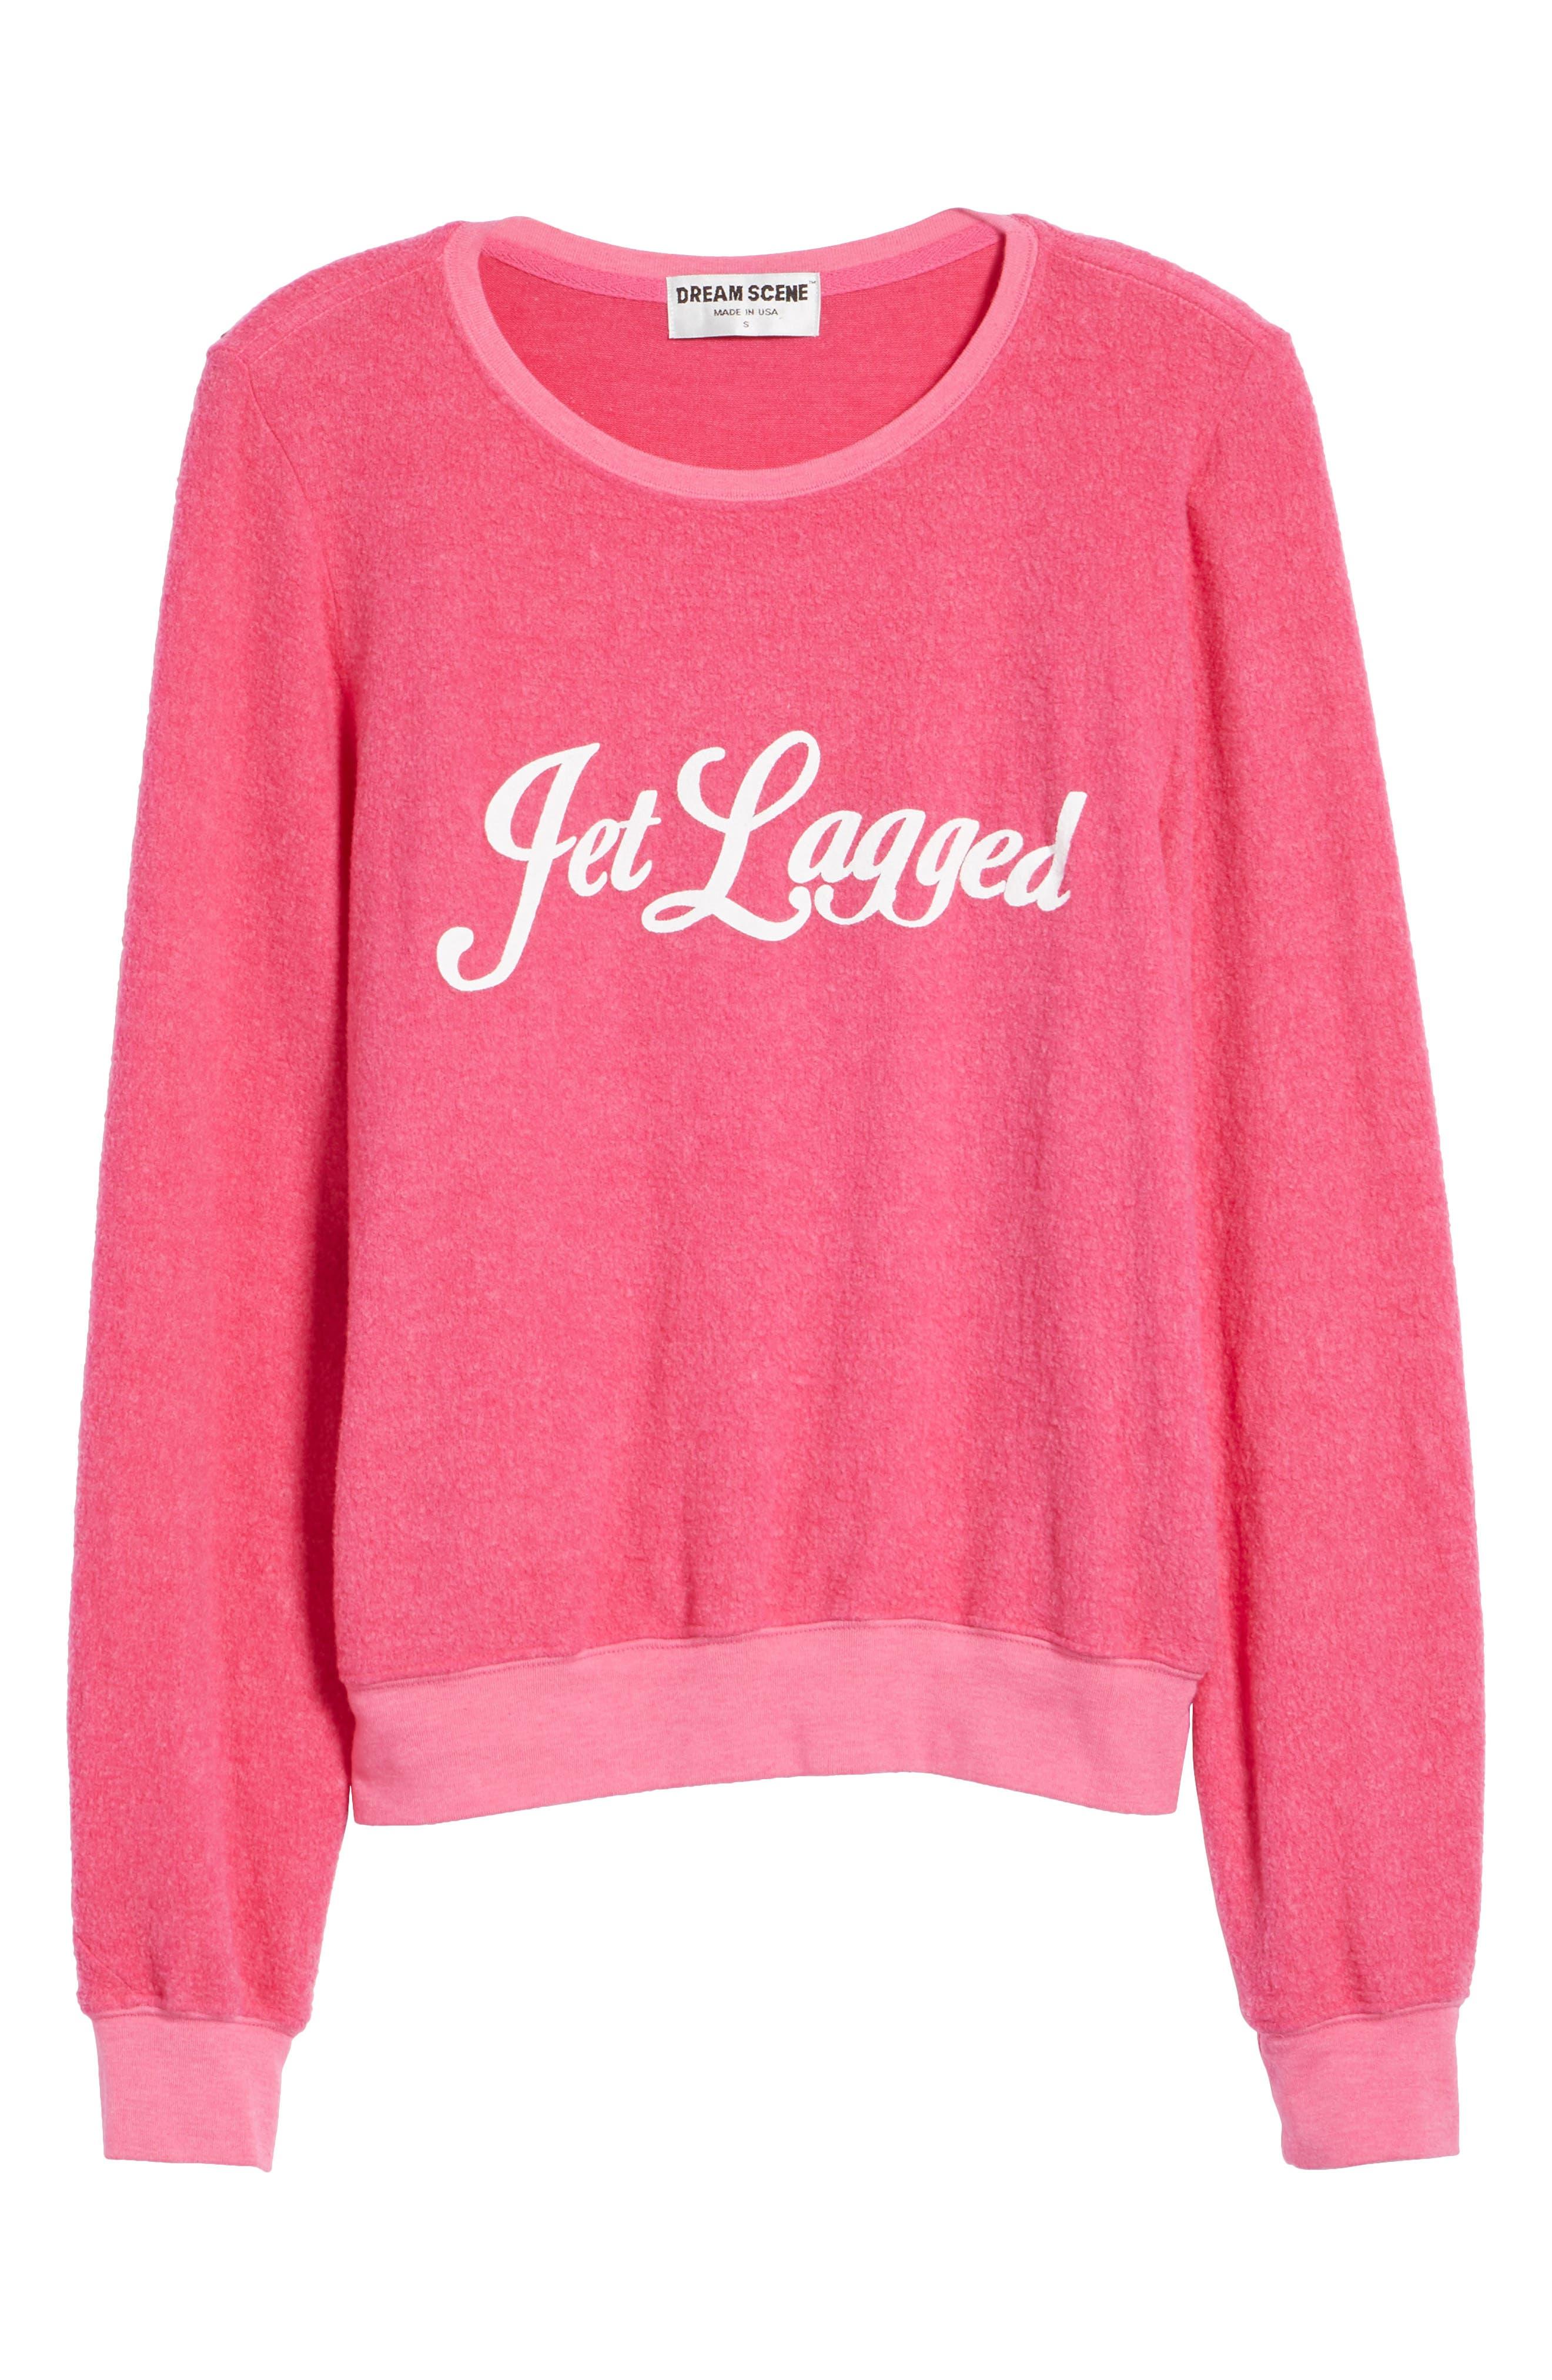 Jet Lagged Sweatshirt,                             Alternate thumbnail 6, color,                             Malibu Pink